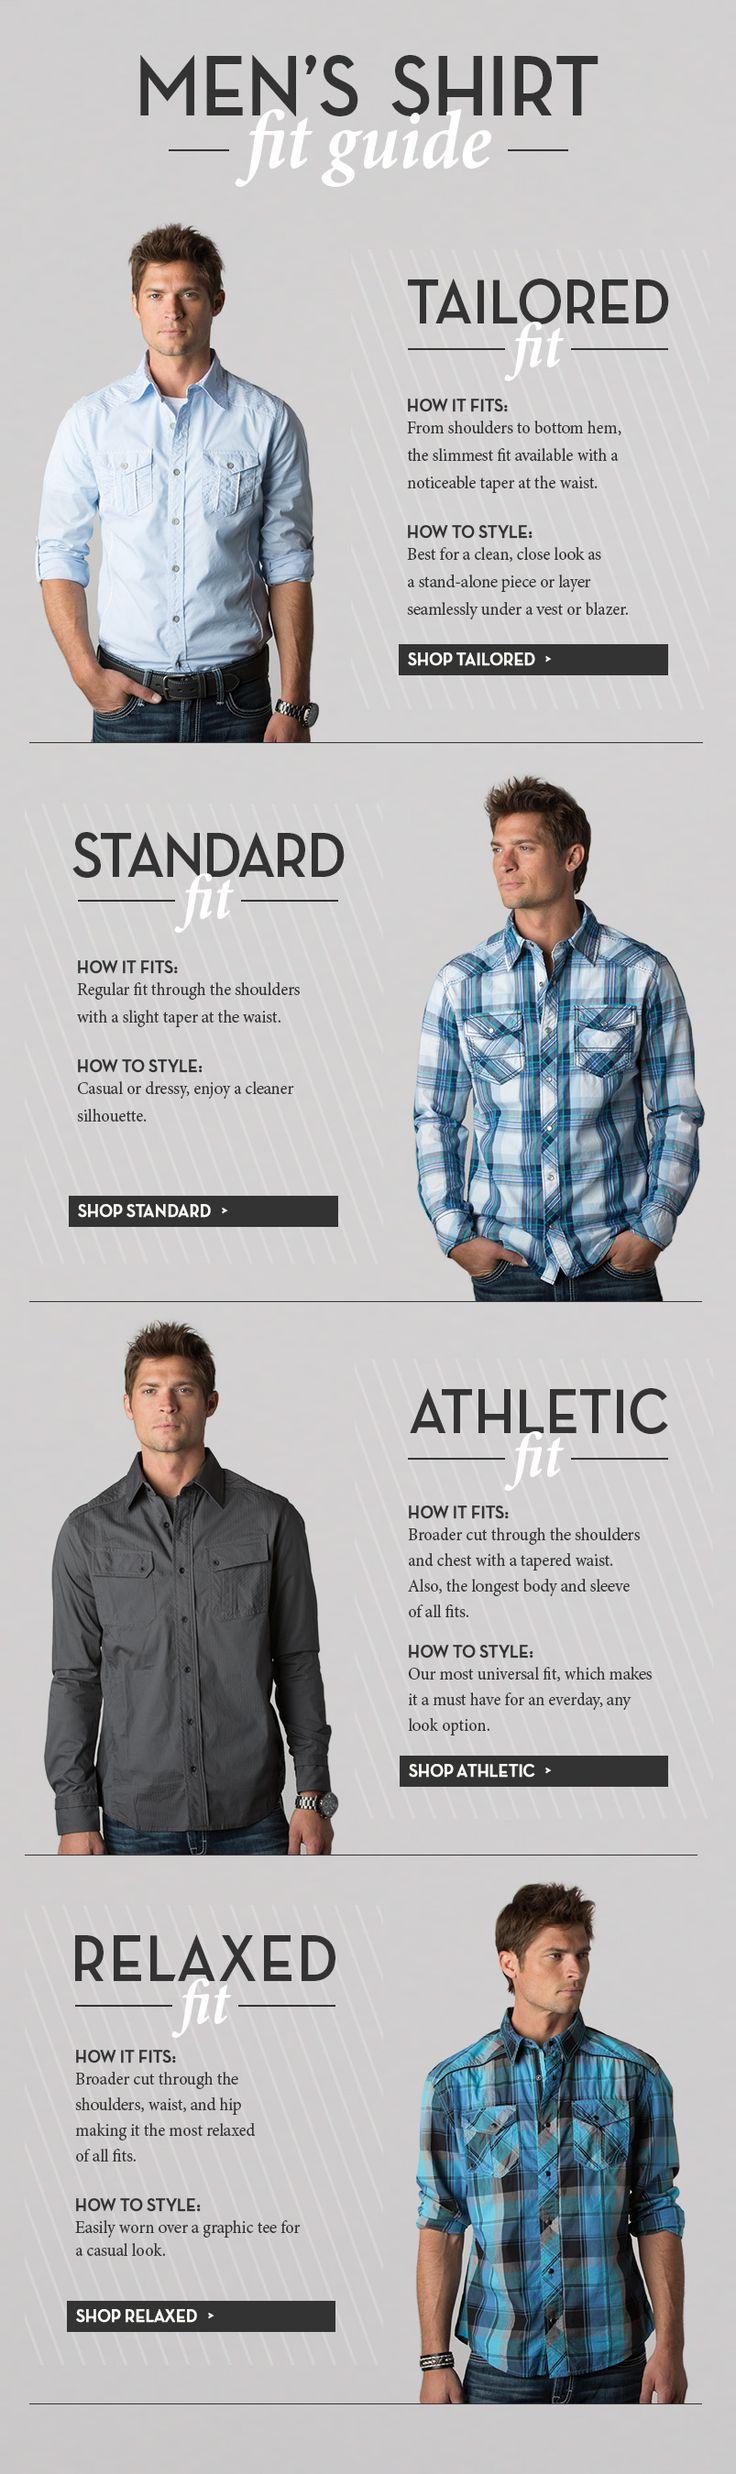 Men's shirt fit guide www.buckle.com